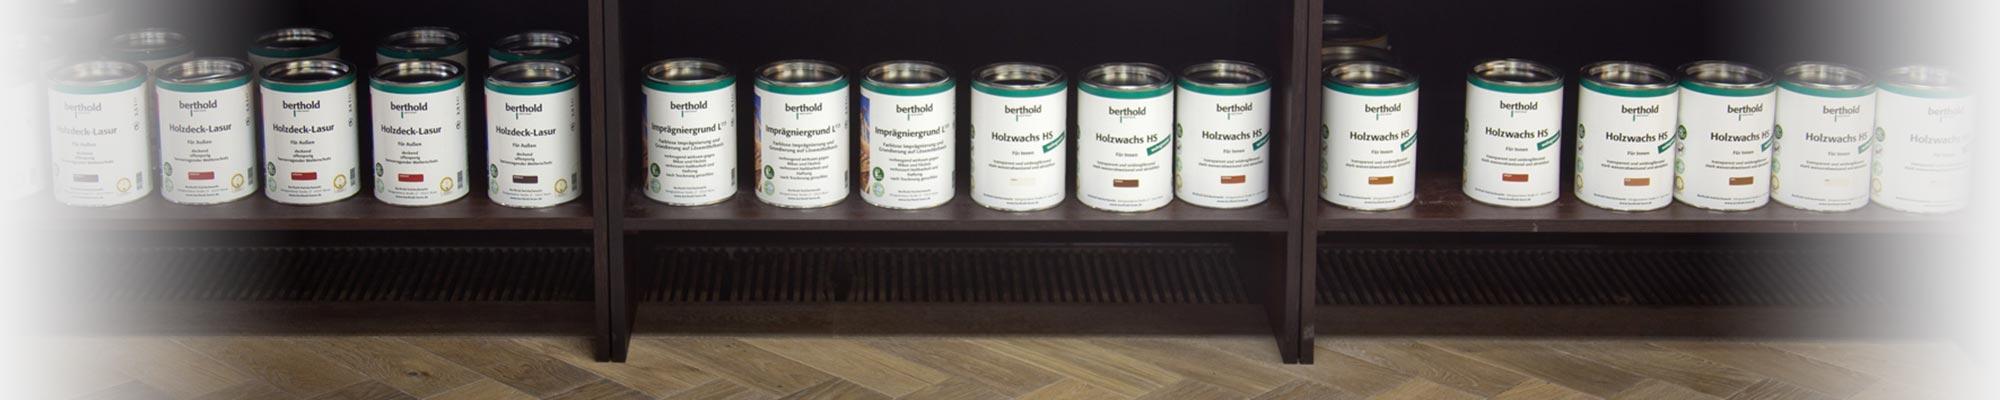 berthold bonn pflege pflegemittel f r alle arten von holzoberfl chen. Black Bedroom Furniture Sets. Home Design Ideas